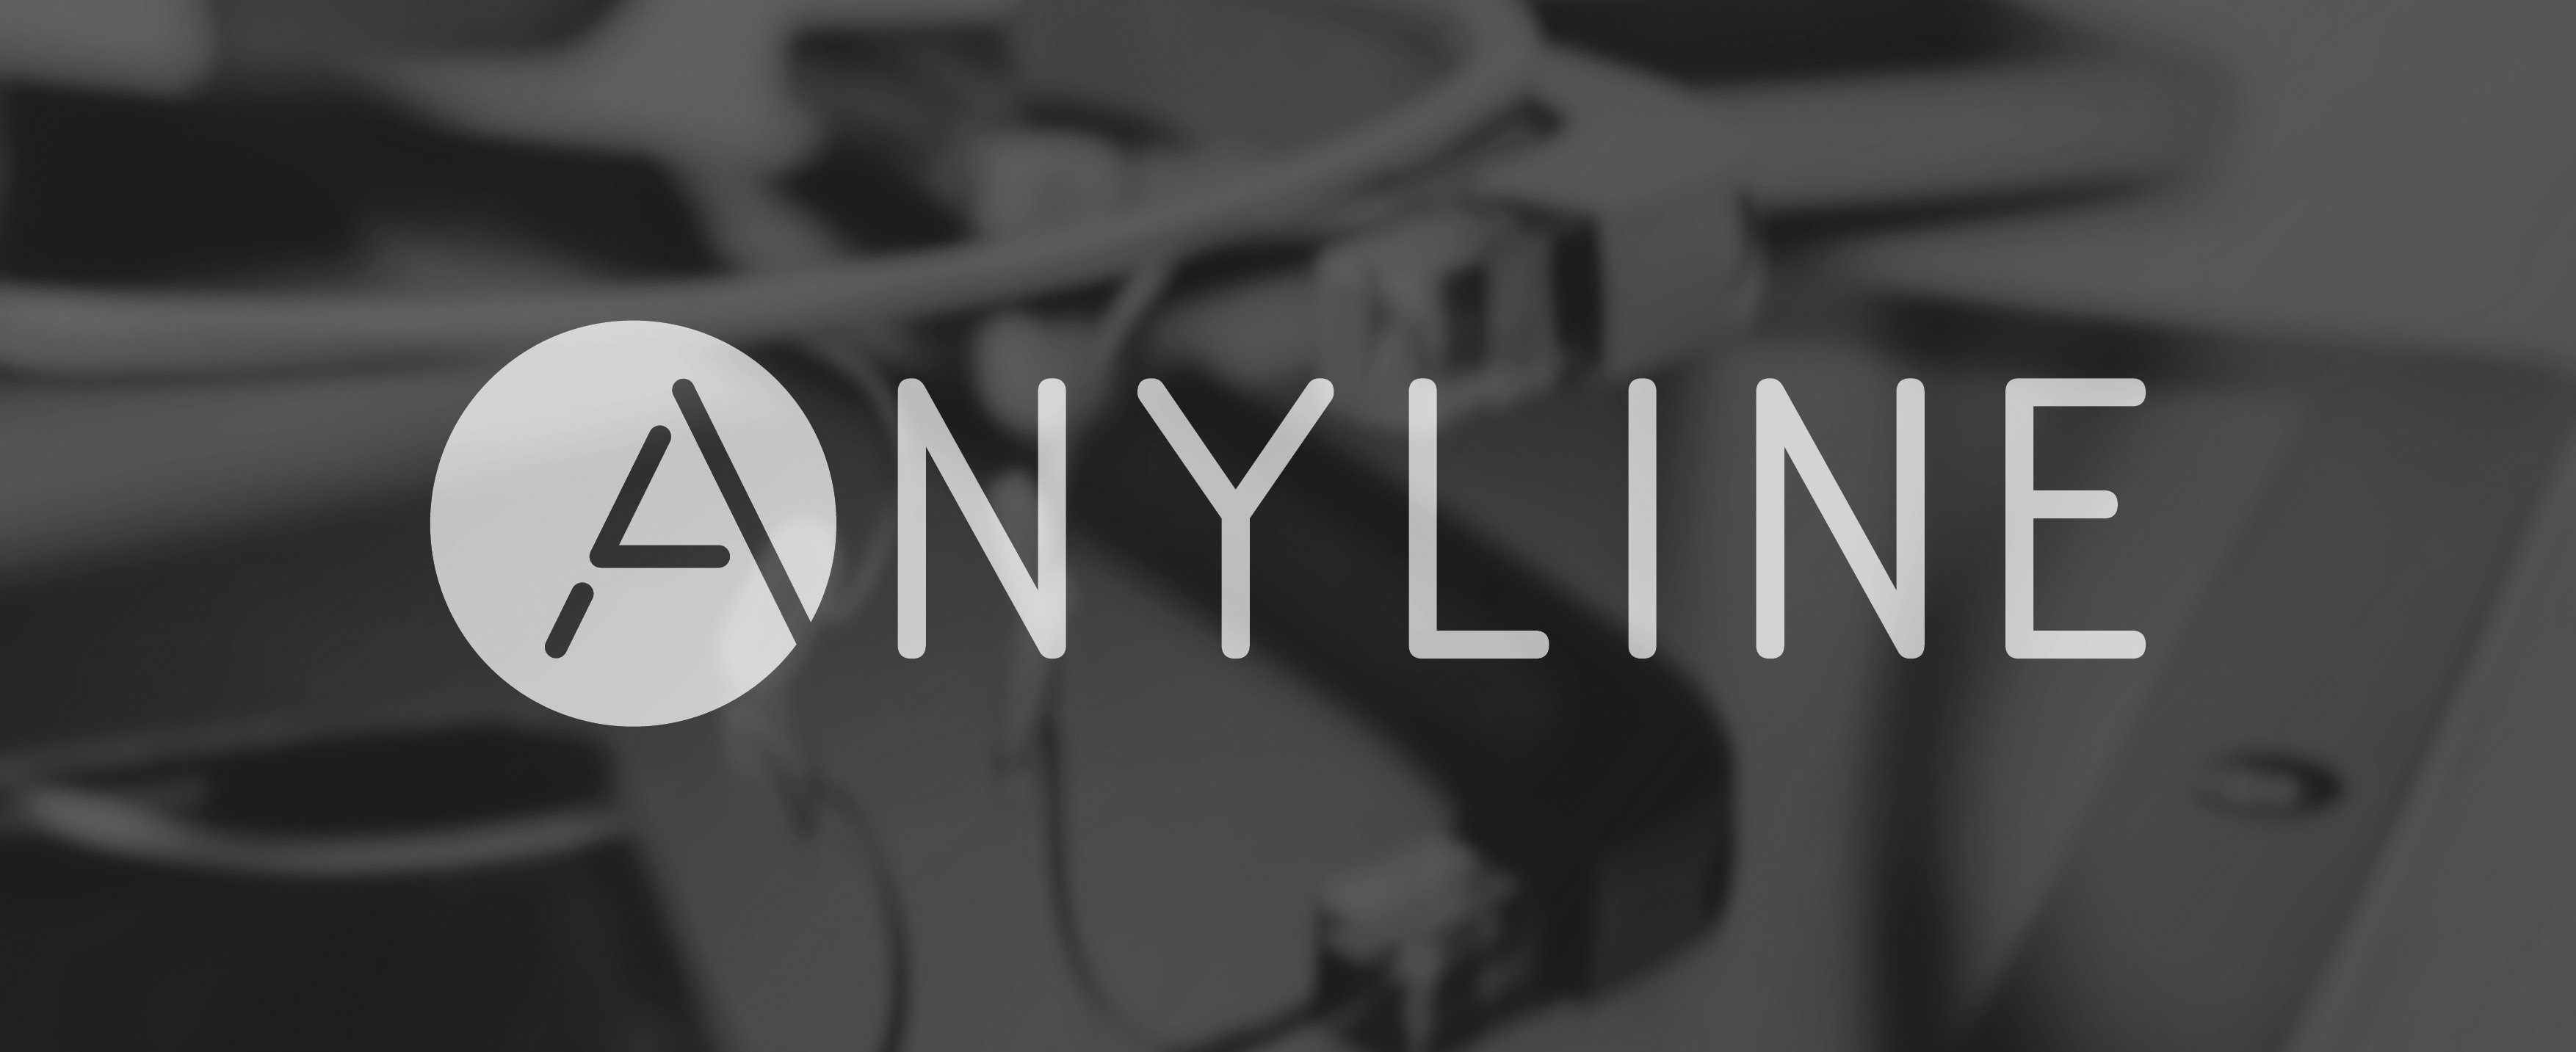 Anyline Branding